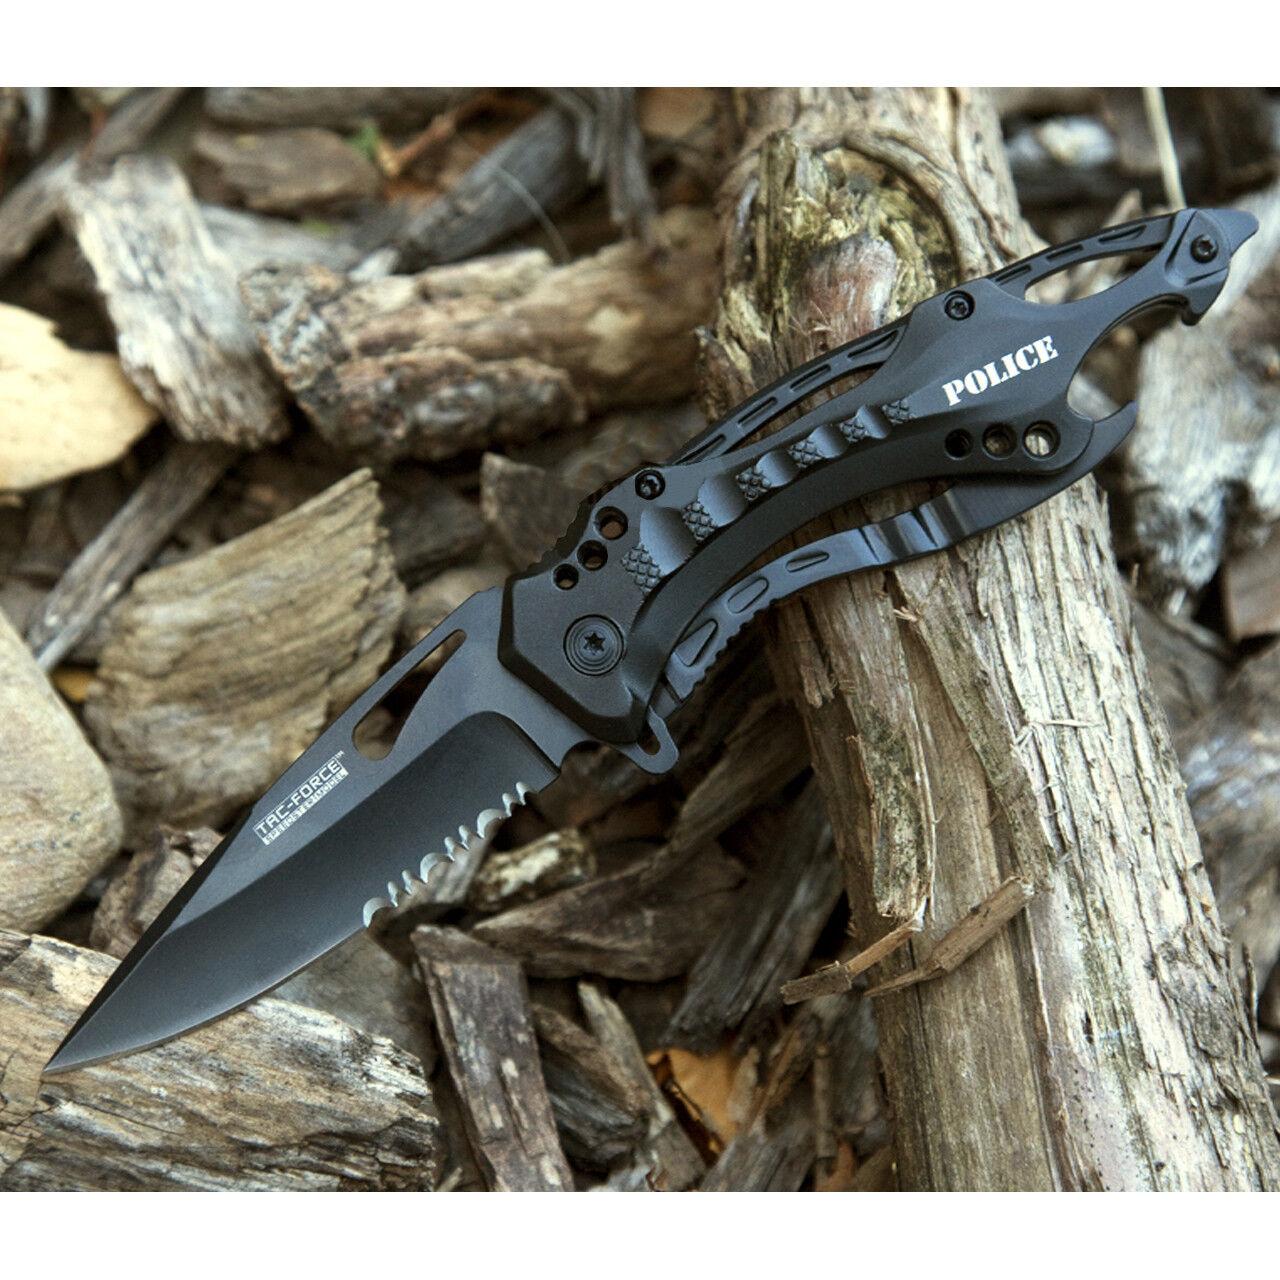 "8"" TACTICAL TAC FORCE POLICE SPRING ASSISTED TACTICAL FOLDING KNIFE Blade Pocket"